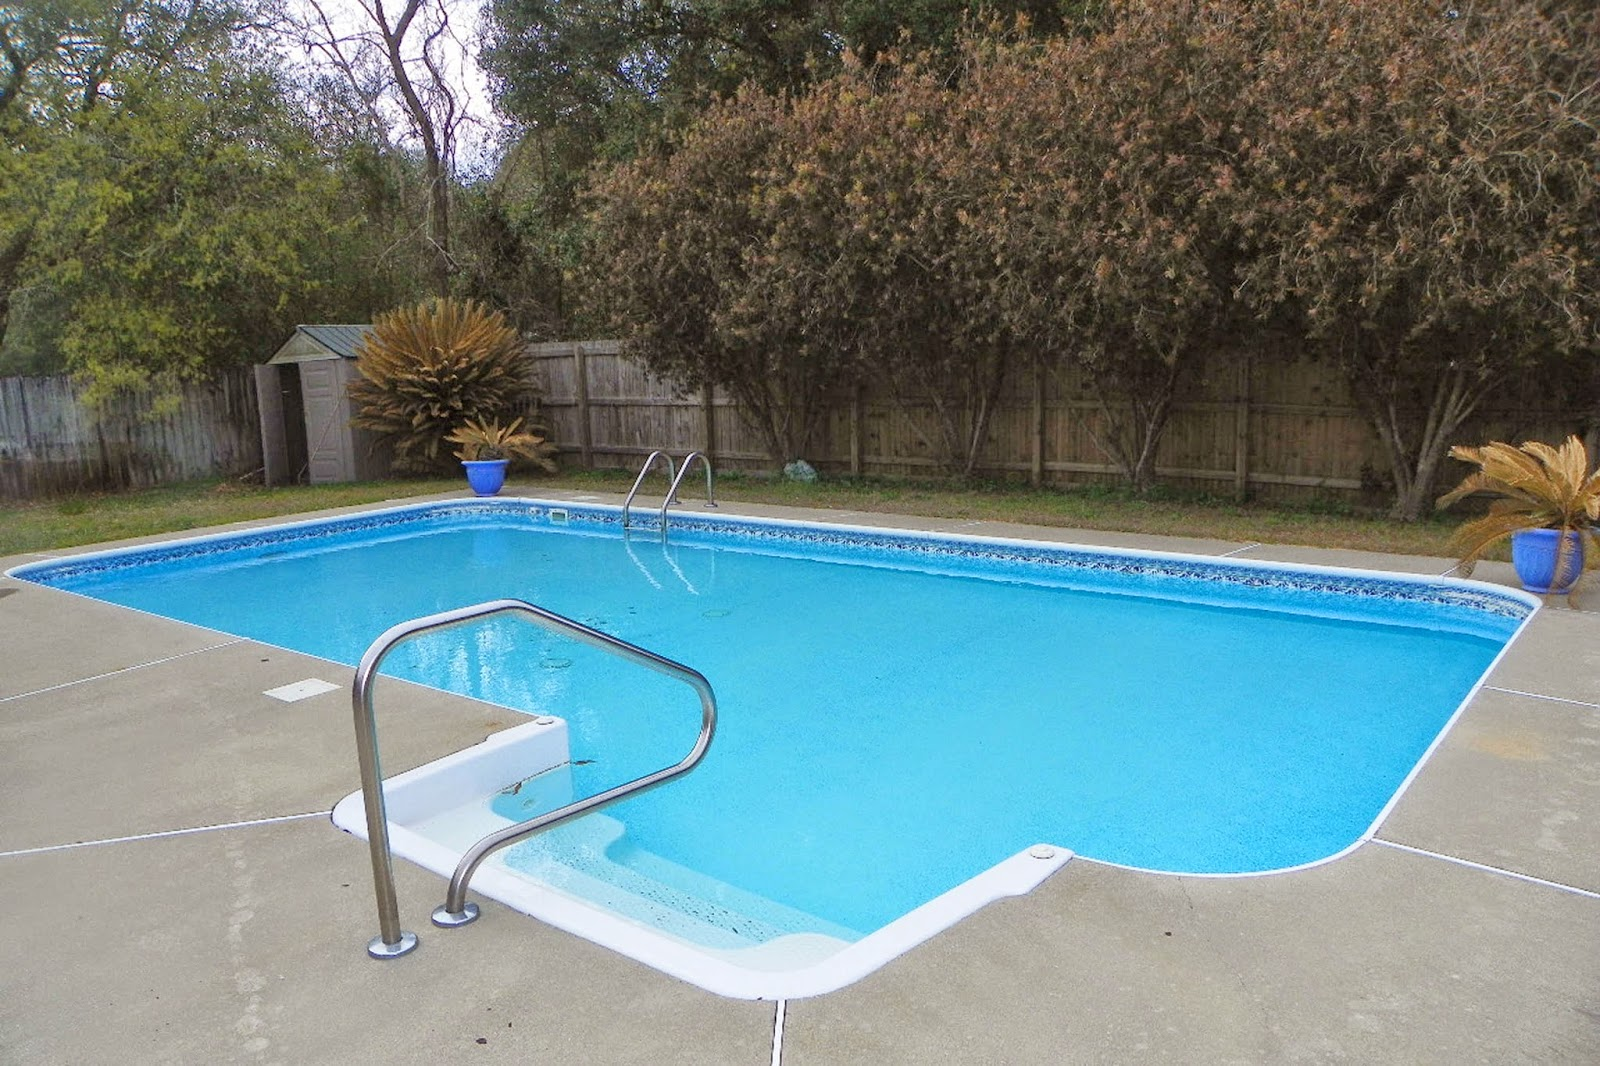 live pensacola florida pool homes rent pensacola fl home swimming pools diy kris allen daily